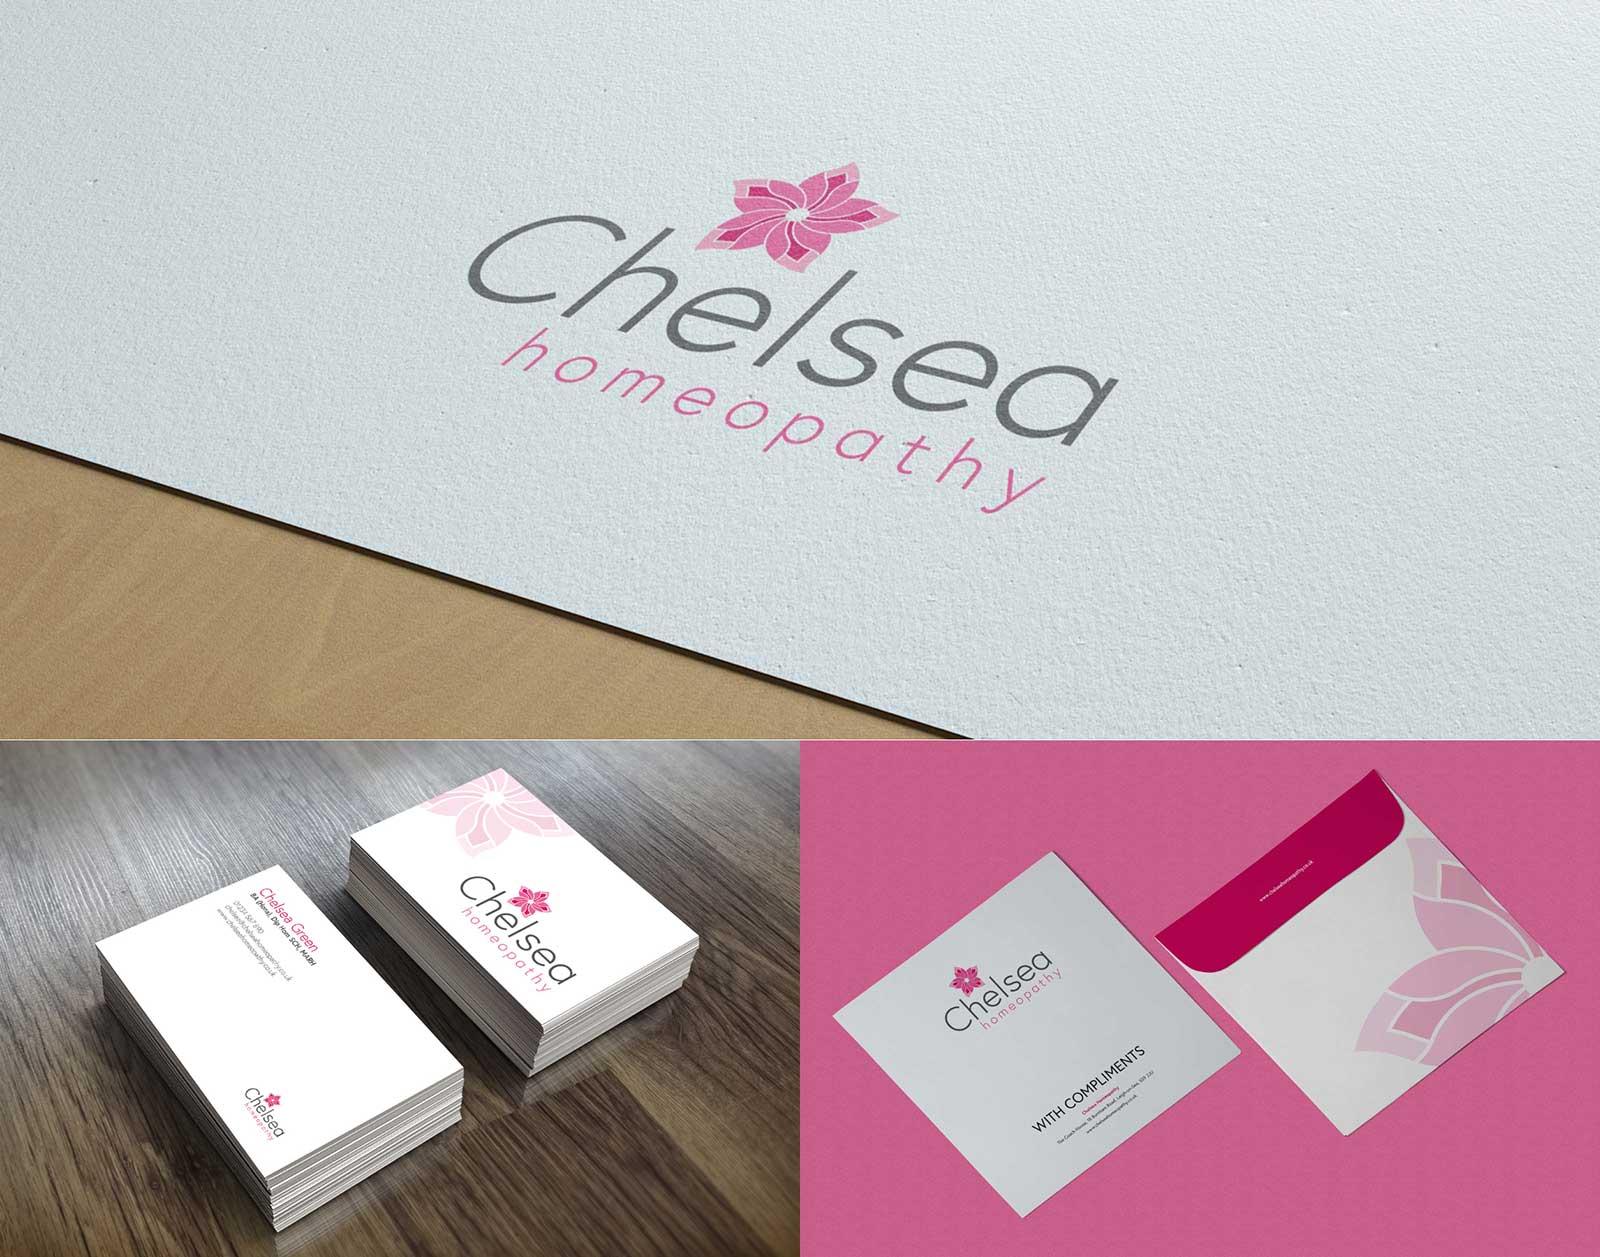 Chelsea Homeopathy Brand & Logo design Mockups